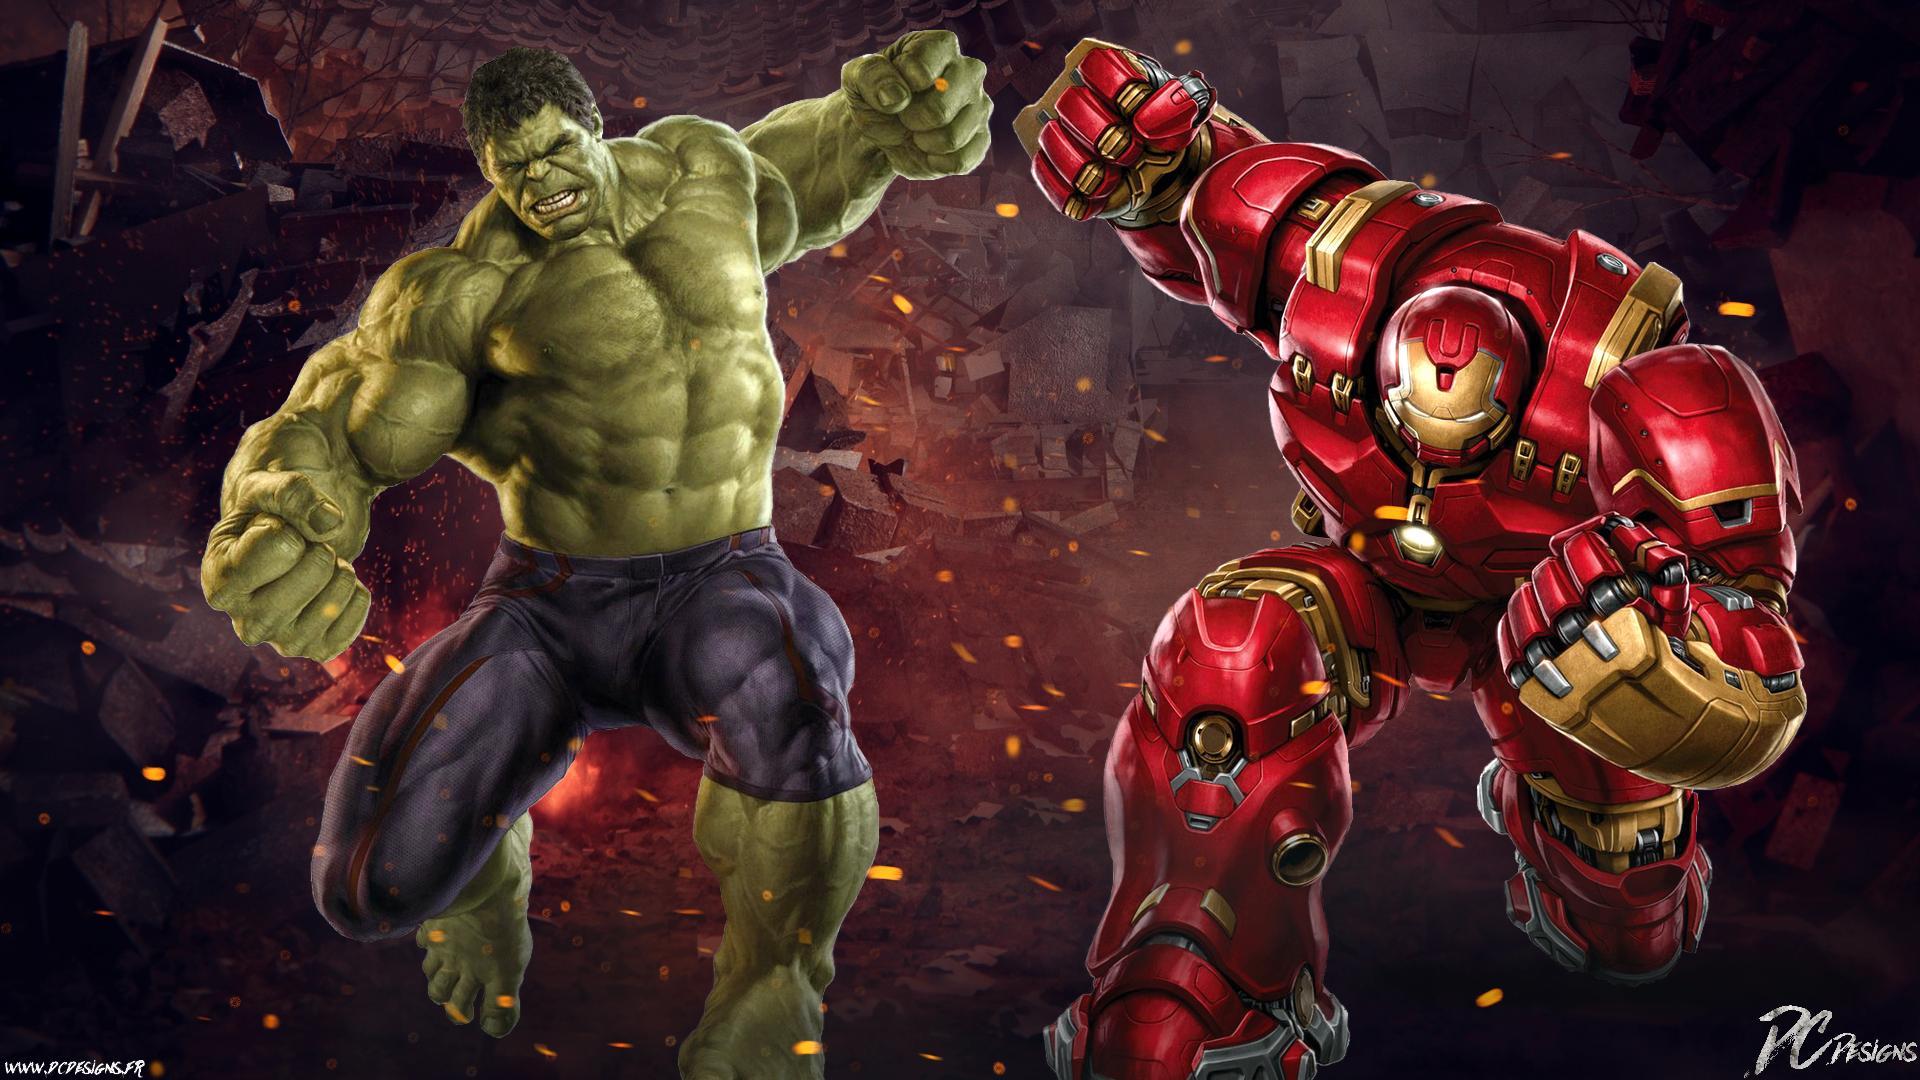 Hulk vs hulkbuster fonds d 39 cran arri res plan - Telecharger hulk ...